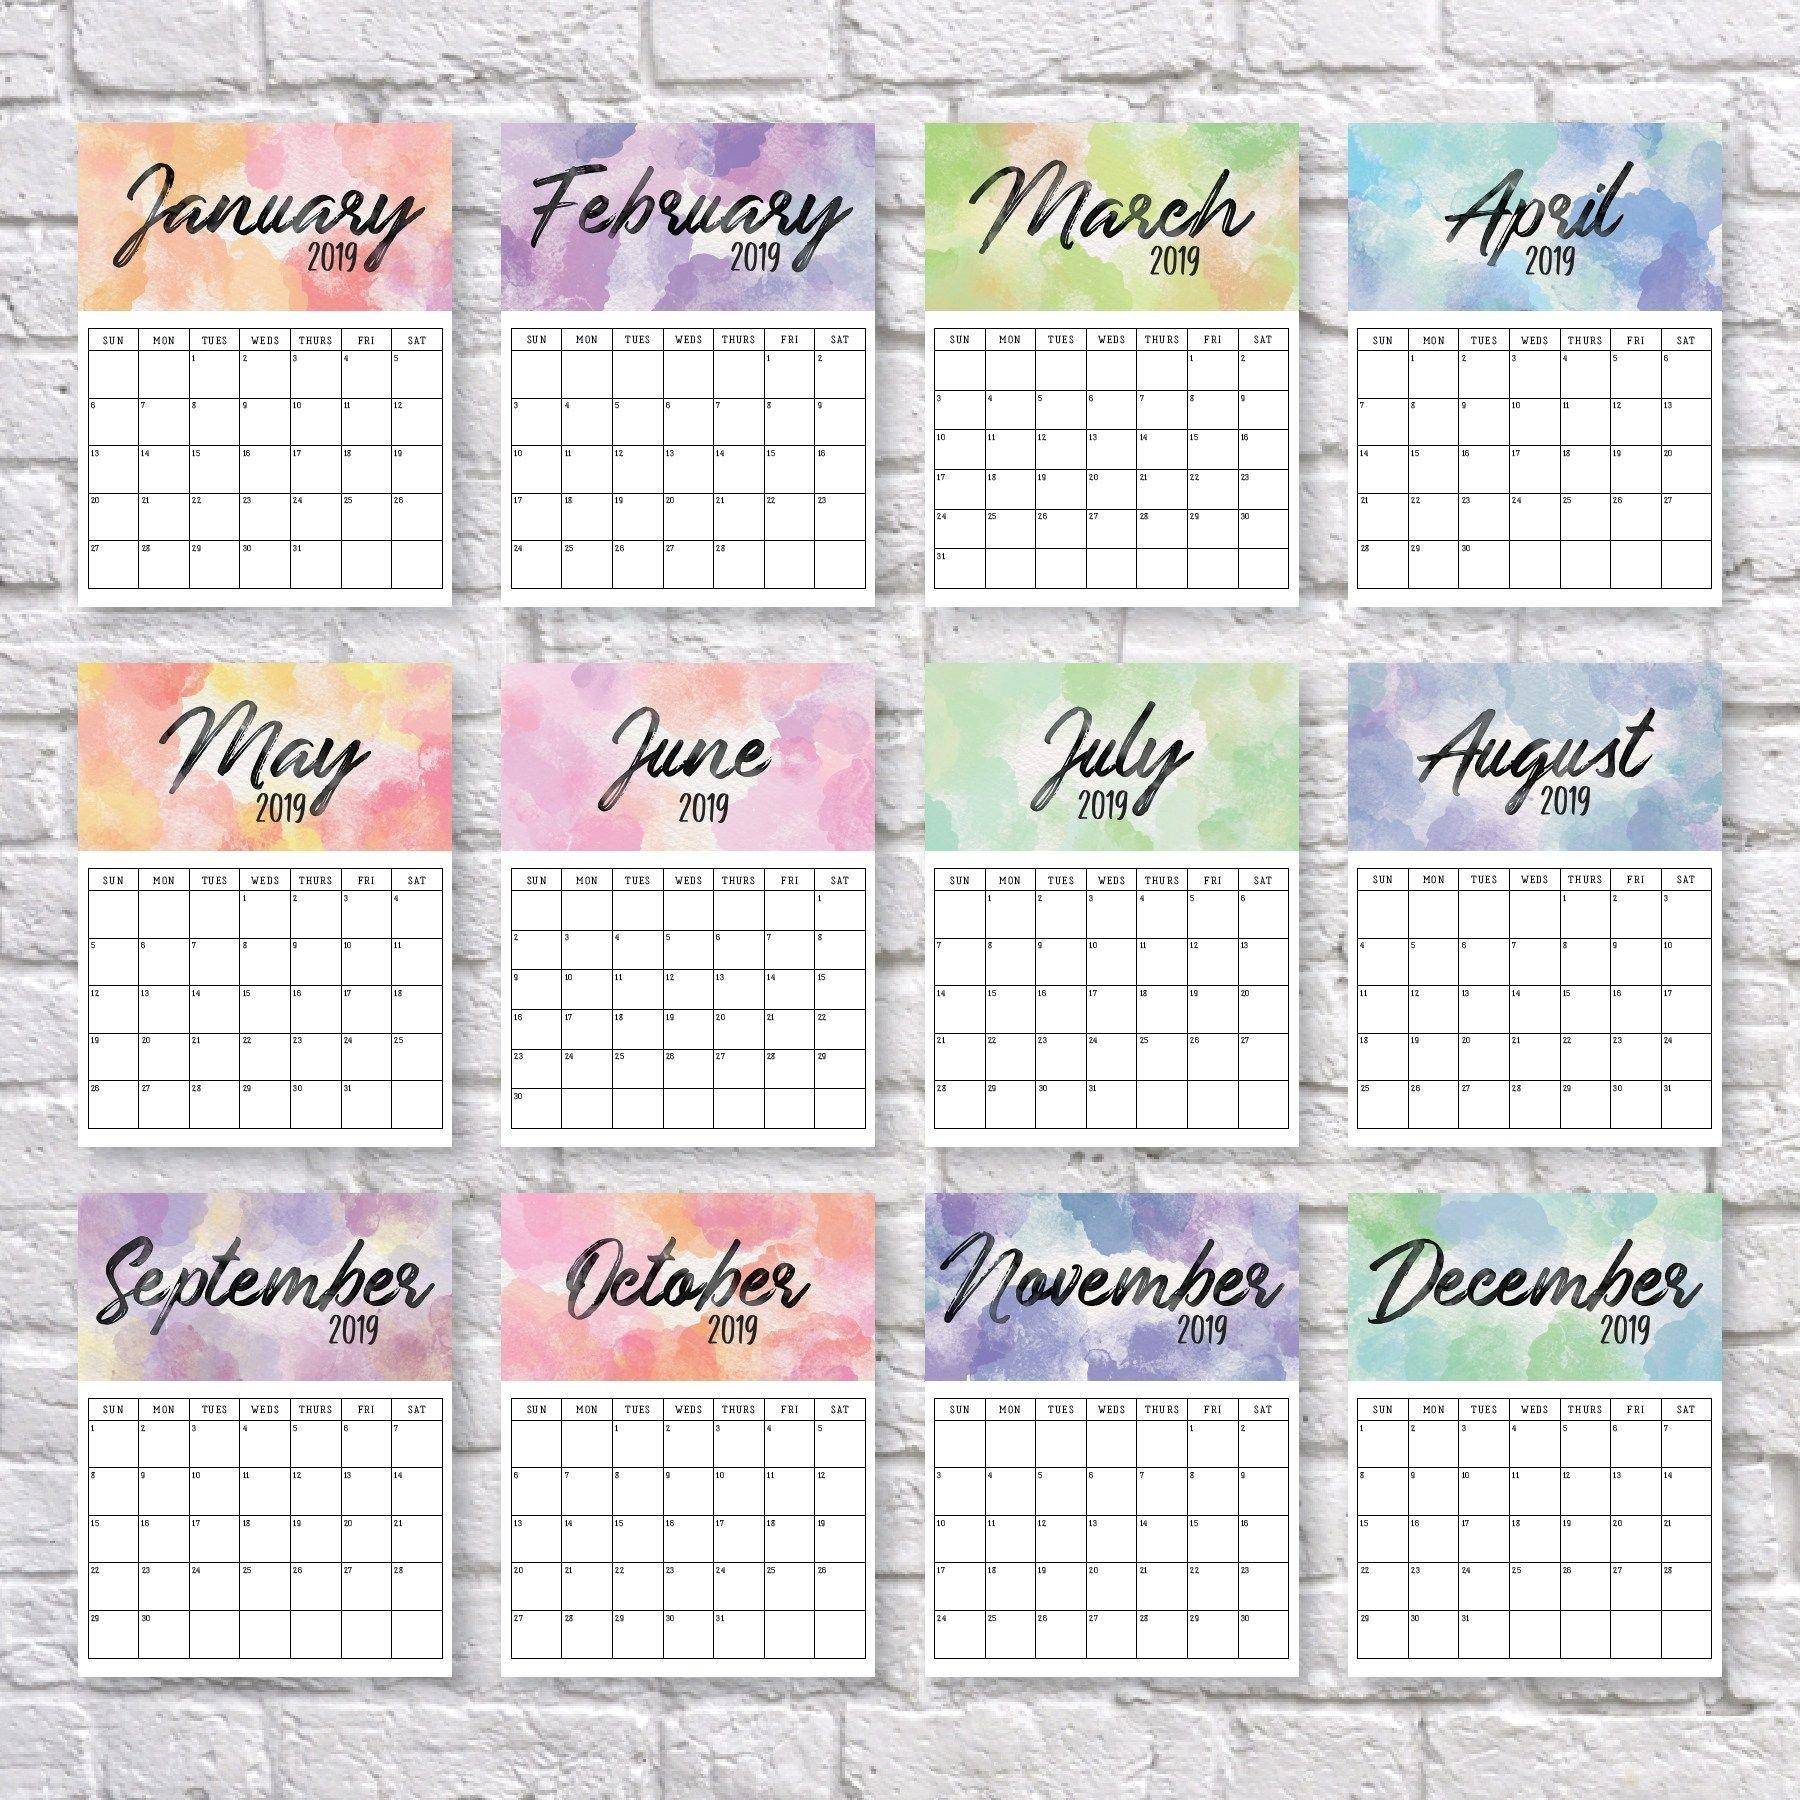 2020 Printable Calendar   Календарь Для Печати, Календарь 5.5 X 8.5 Inch Calendar